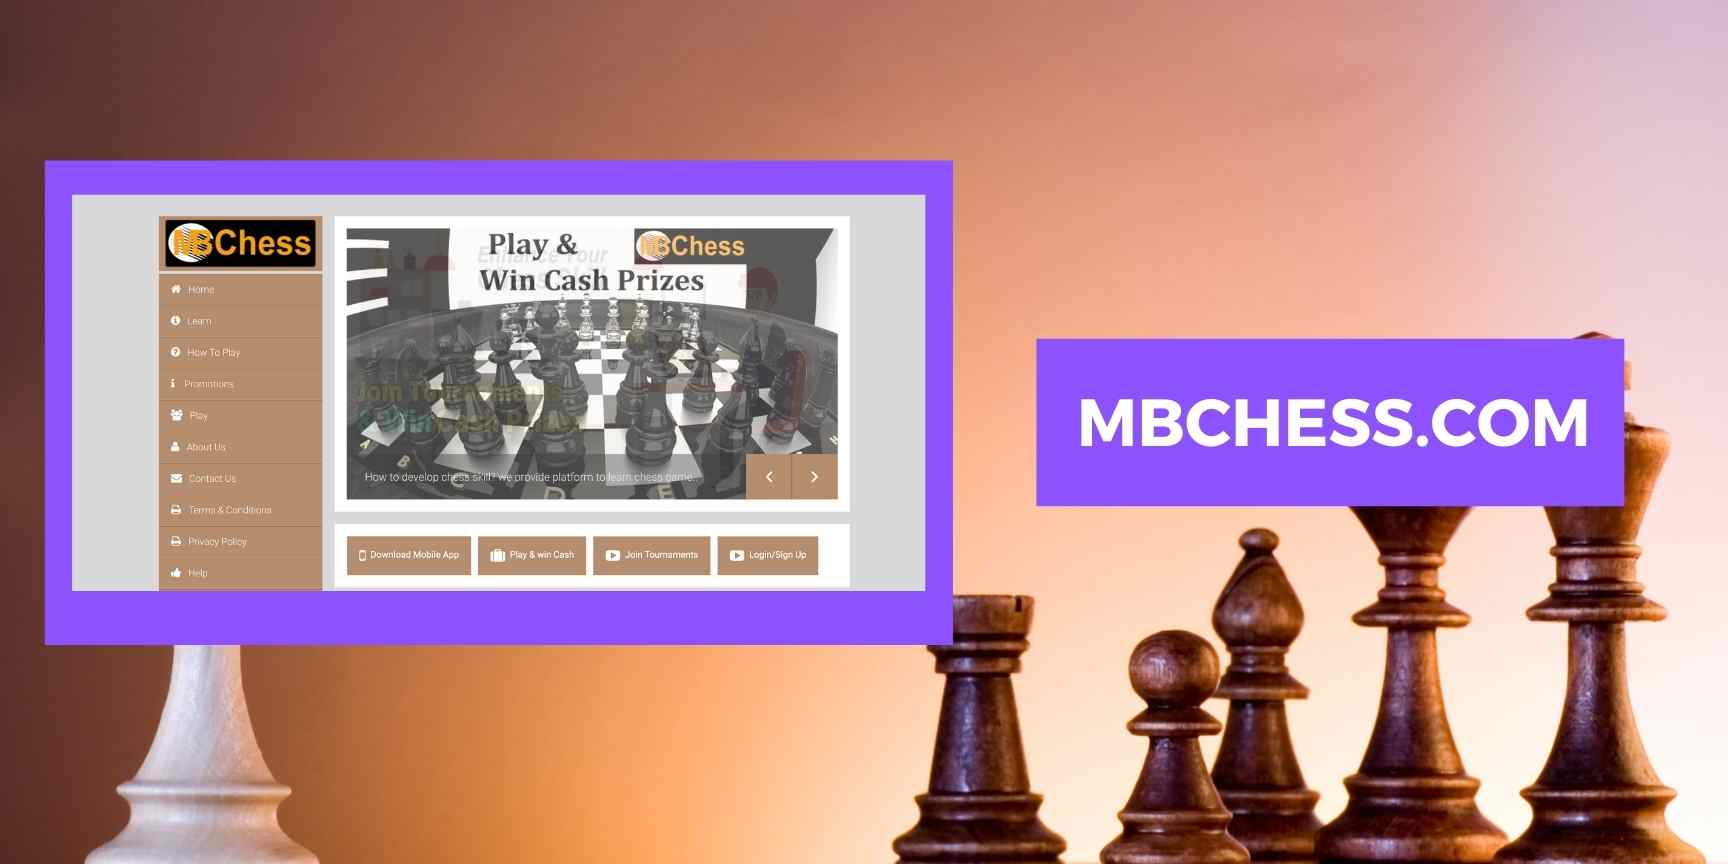 MBChess.com